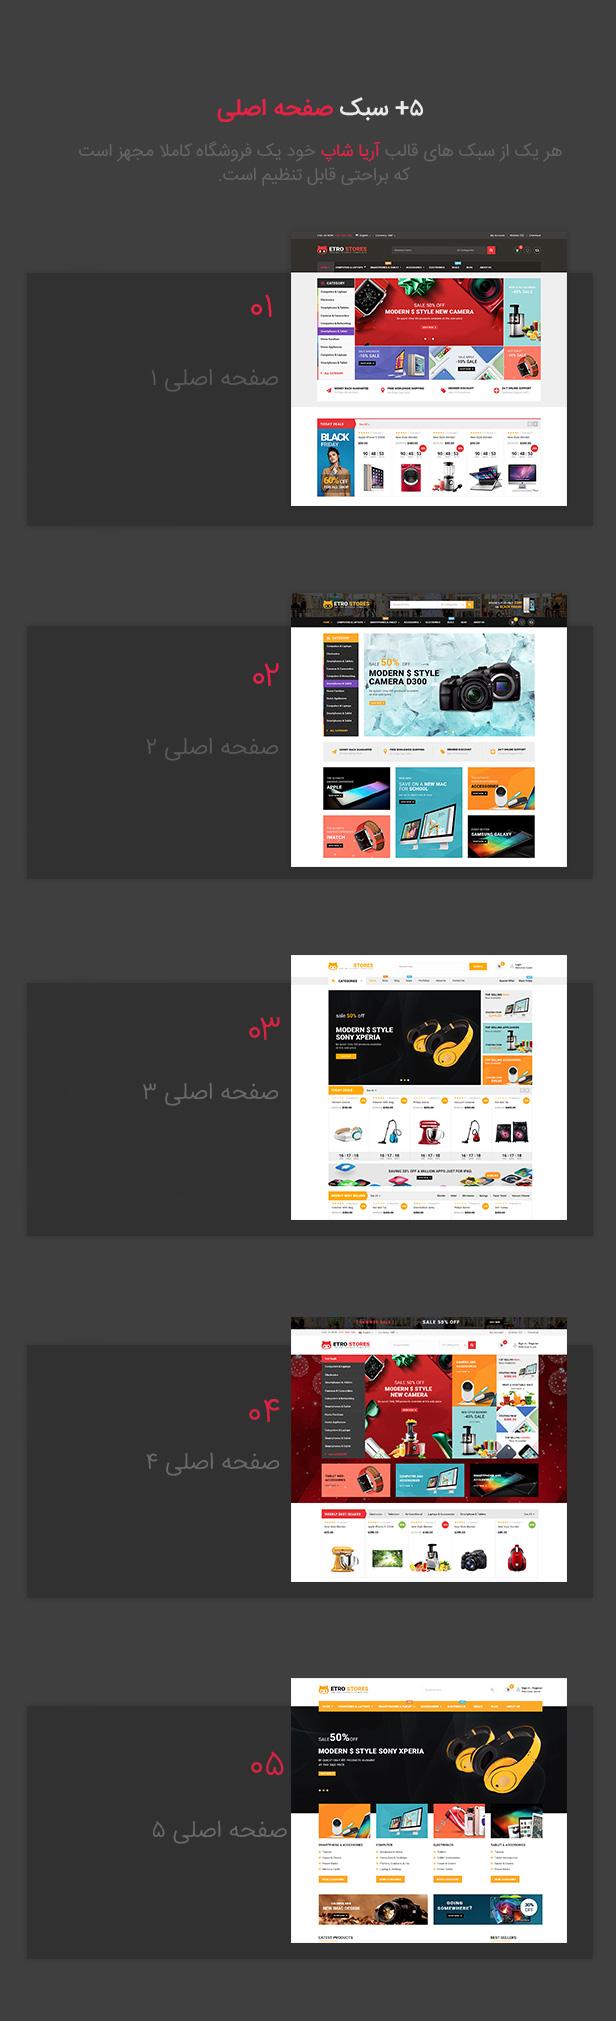 http://s8.picofile.com/file/8315404992/Etro_store_1.jpg